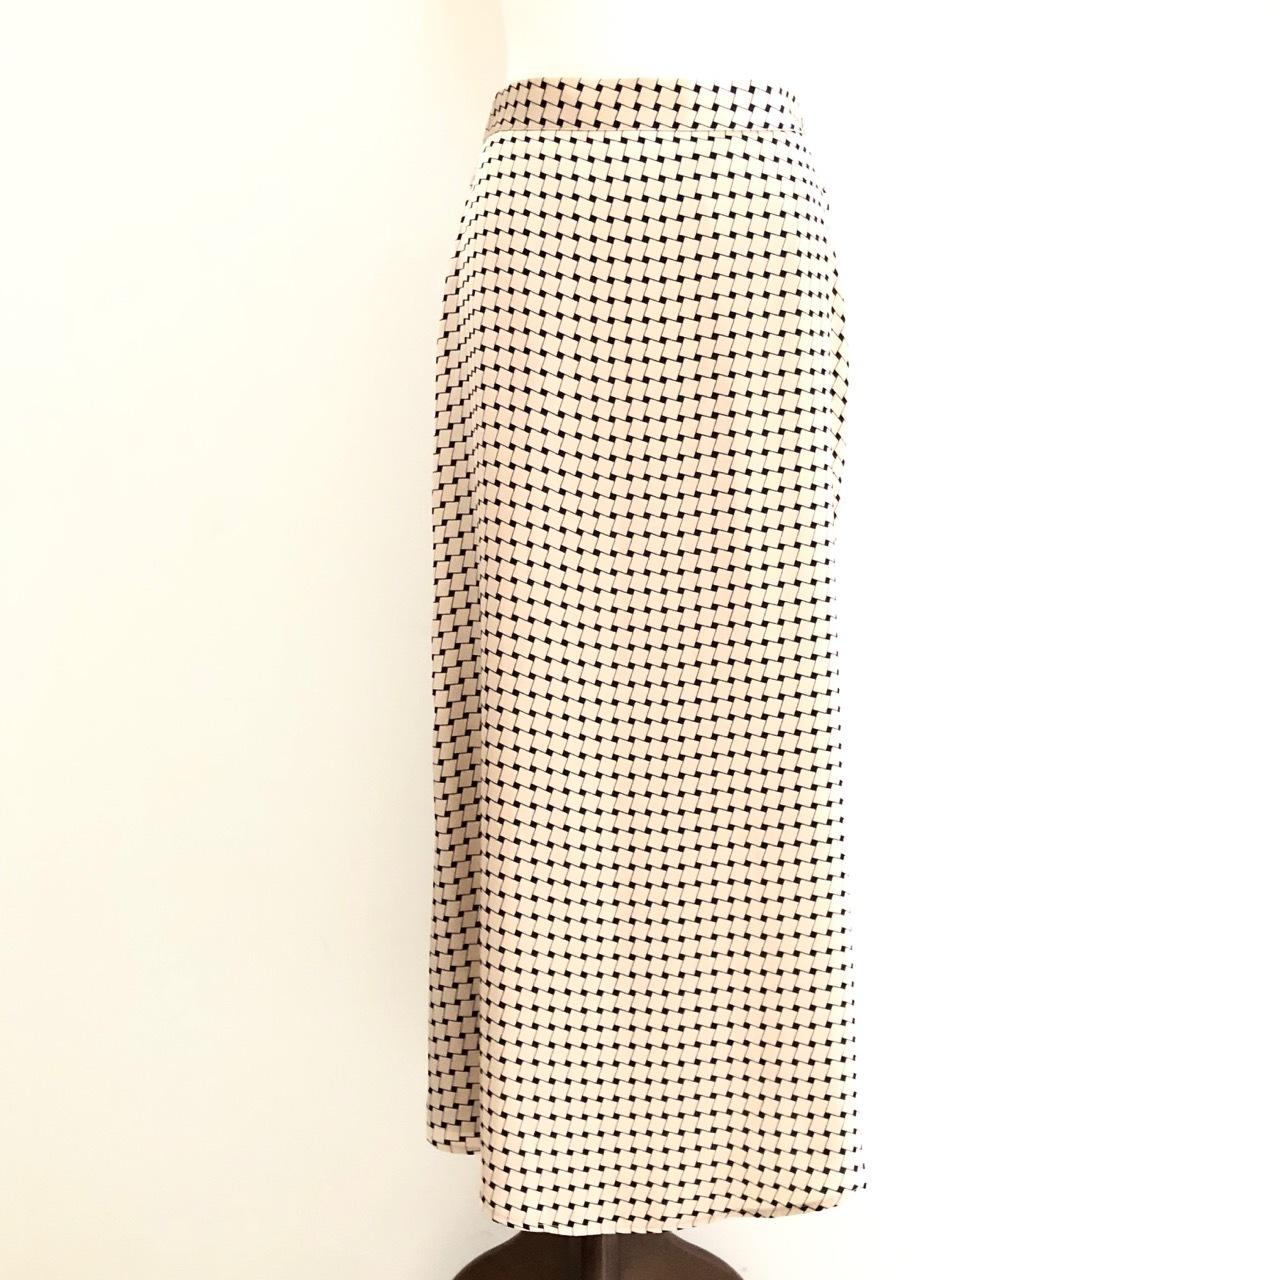 【 Chignonstar 】- 22902-251 - マーメイドプリントスカート